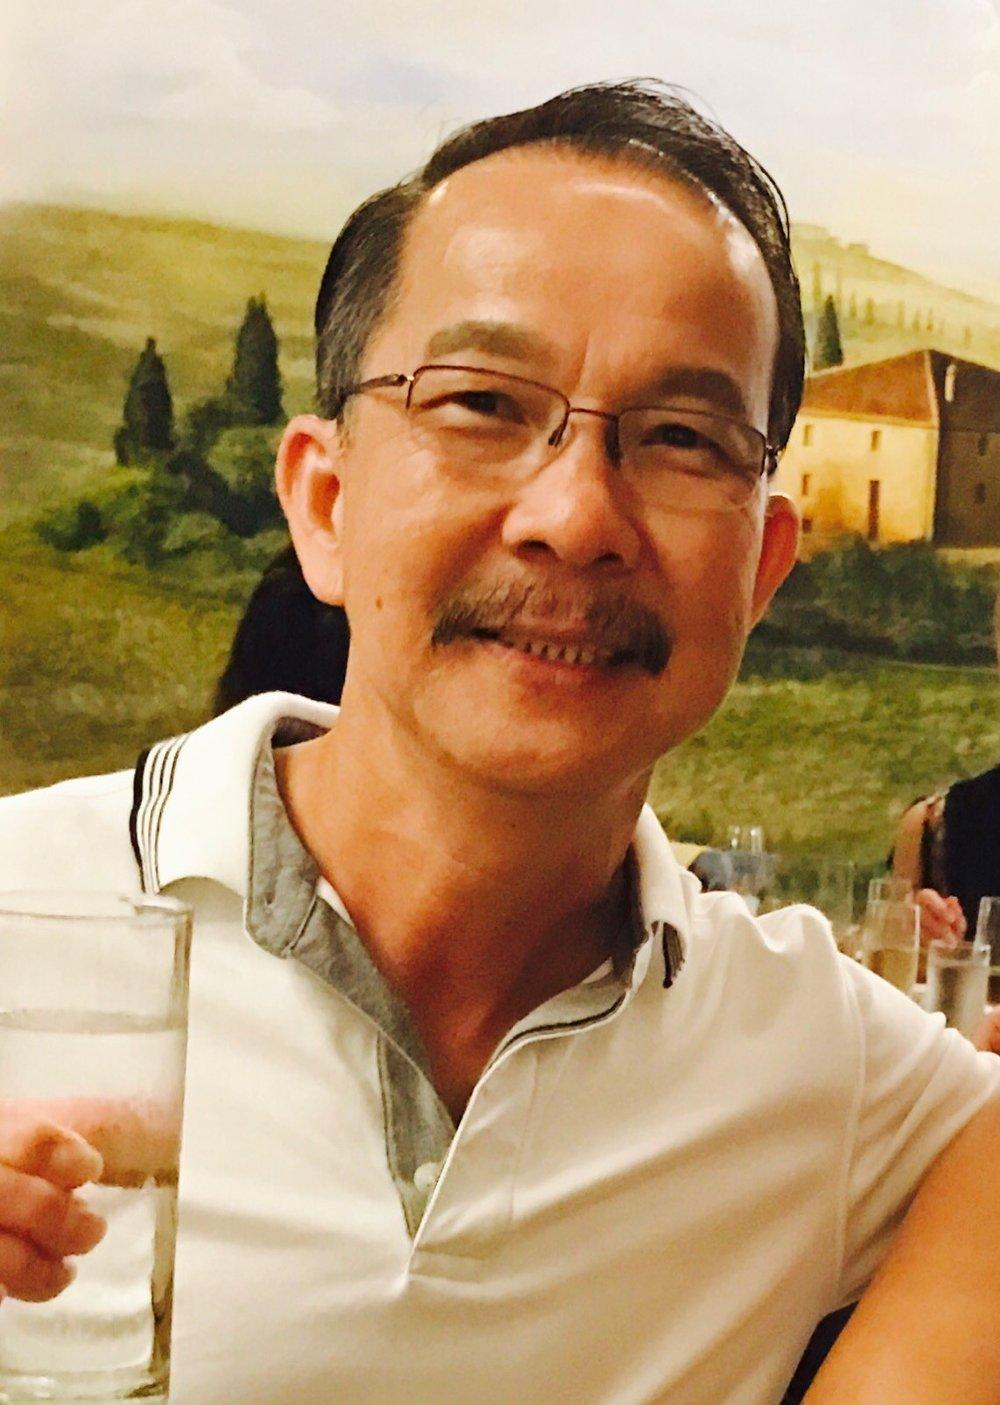 Chef Taylor Chung